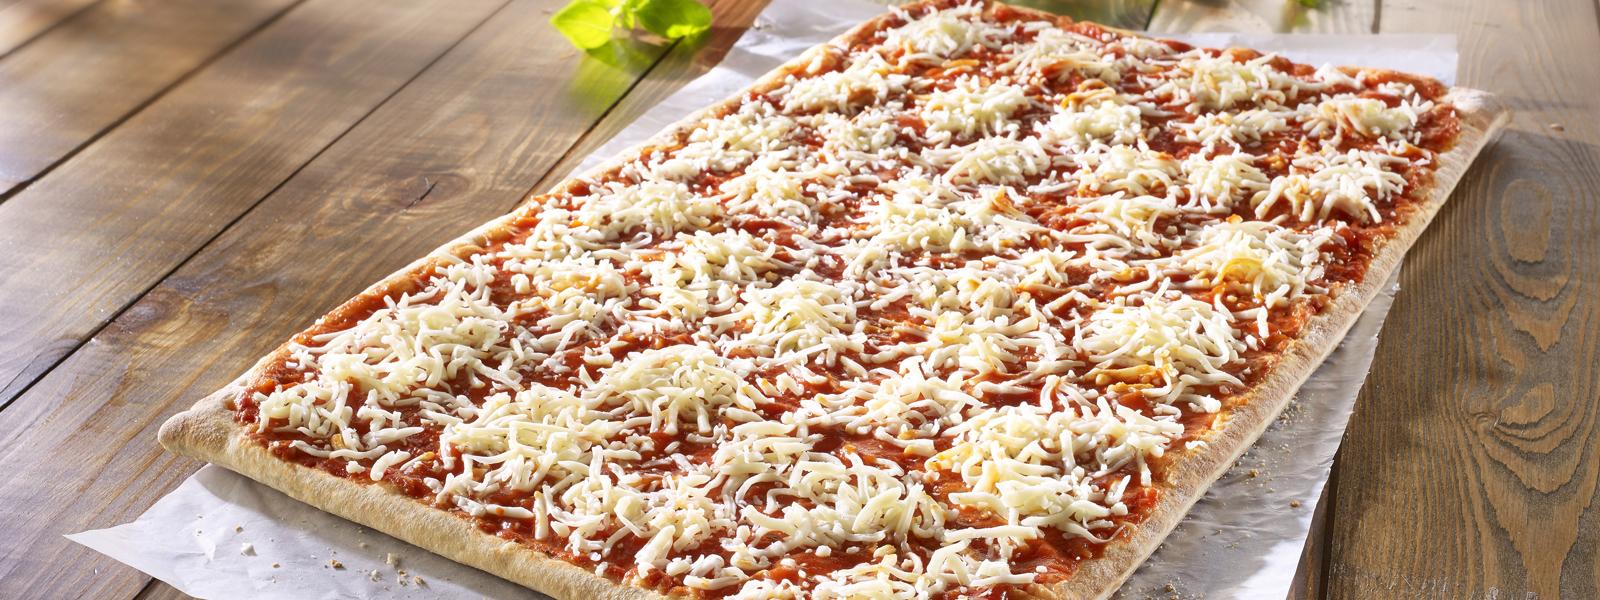 Steinofen Gastro Pizza Margherita